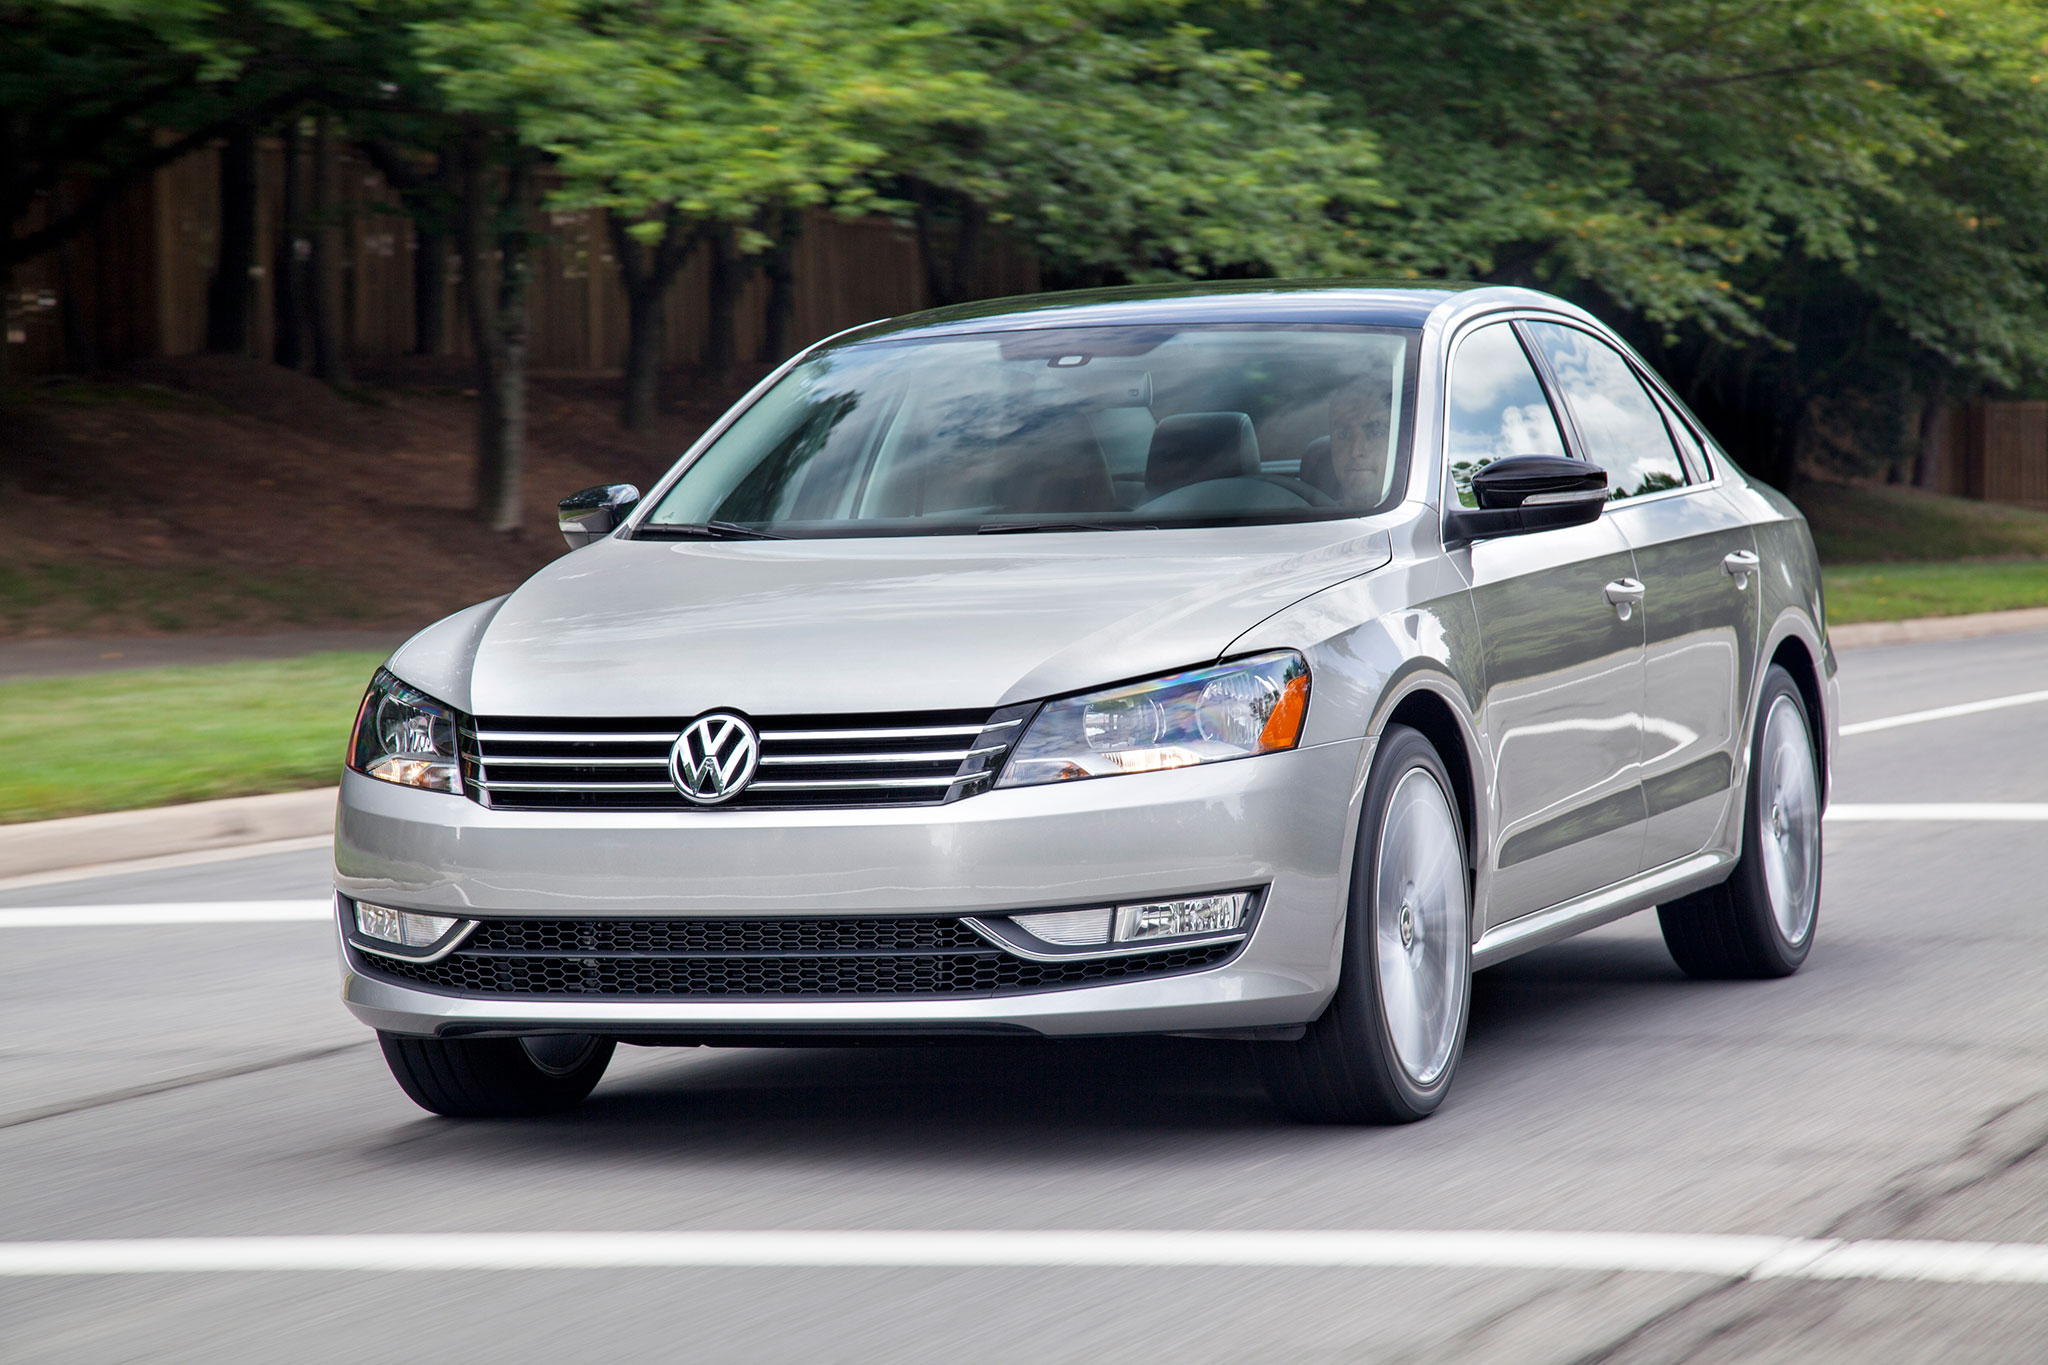 2014 Volkswagen Passat Sport Launched With Unique Design 99 Fuse Diagram Moving Inside